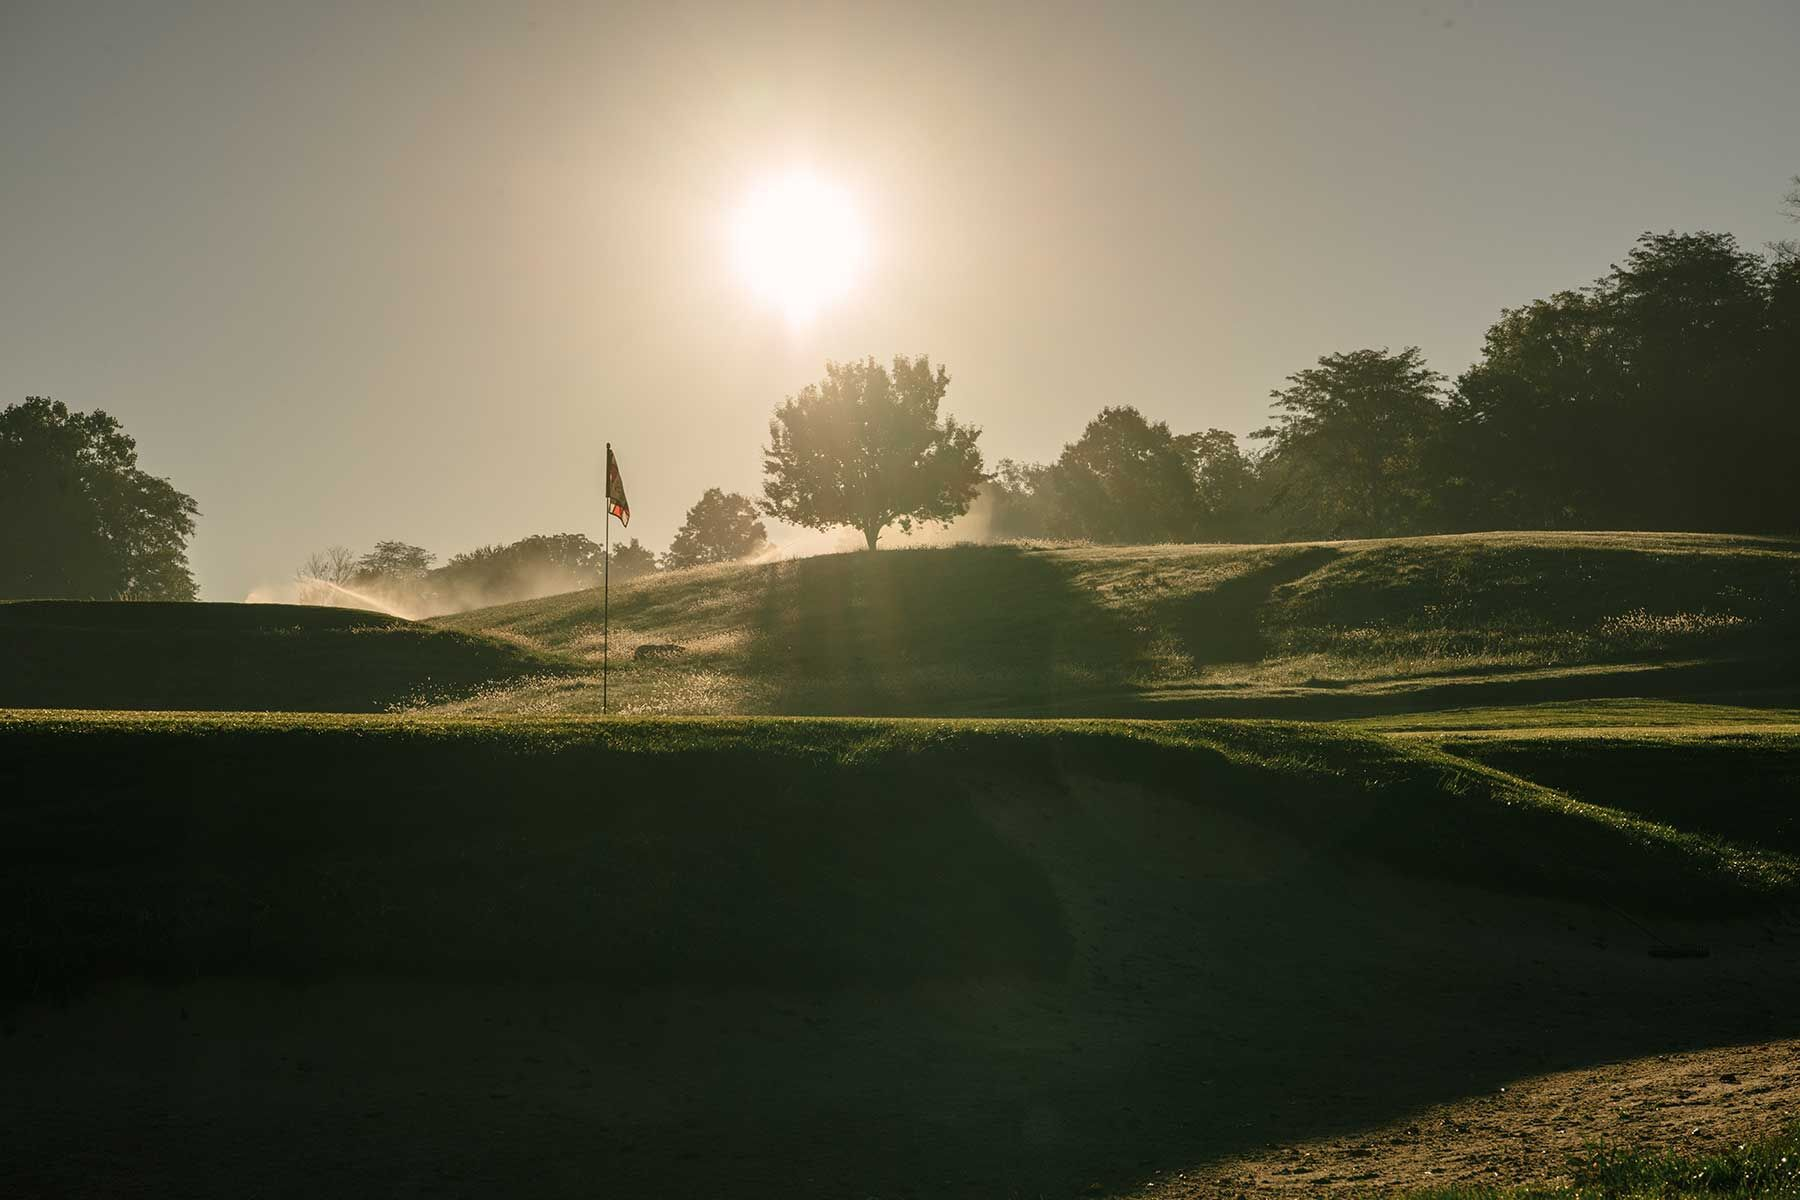 Clarkshaw Meadows Golf